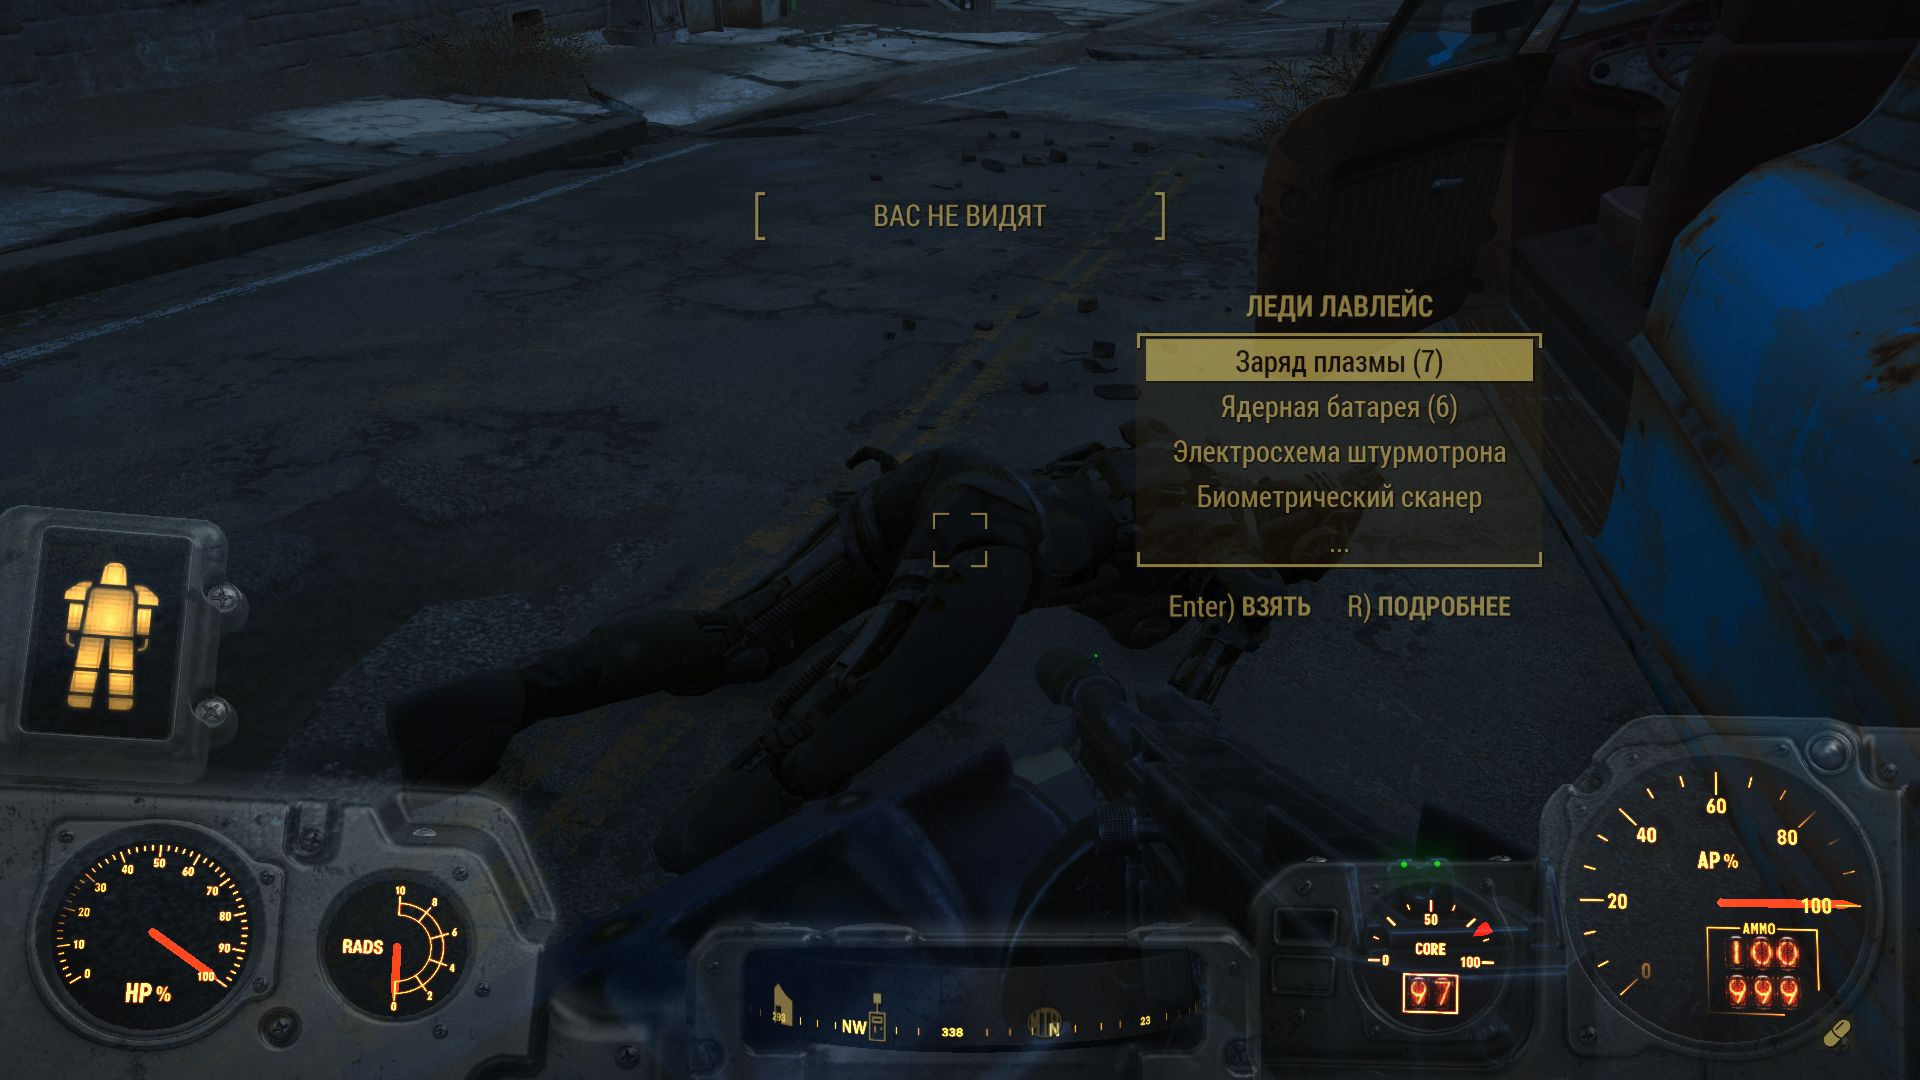 Леди Лавлейз найдена мертвой - Fallout 4 Лавлейз, штурмотрон